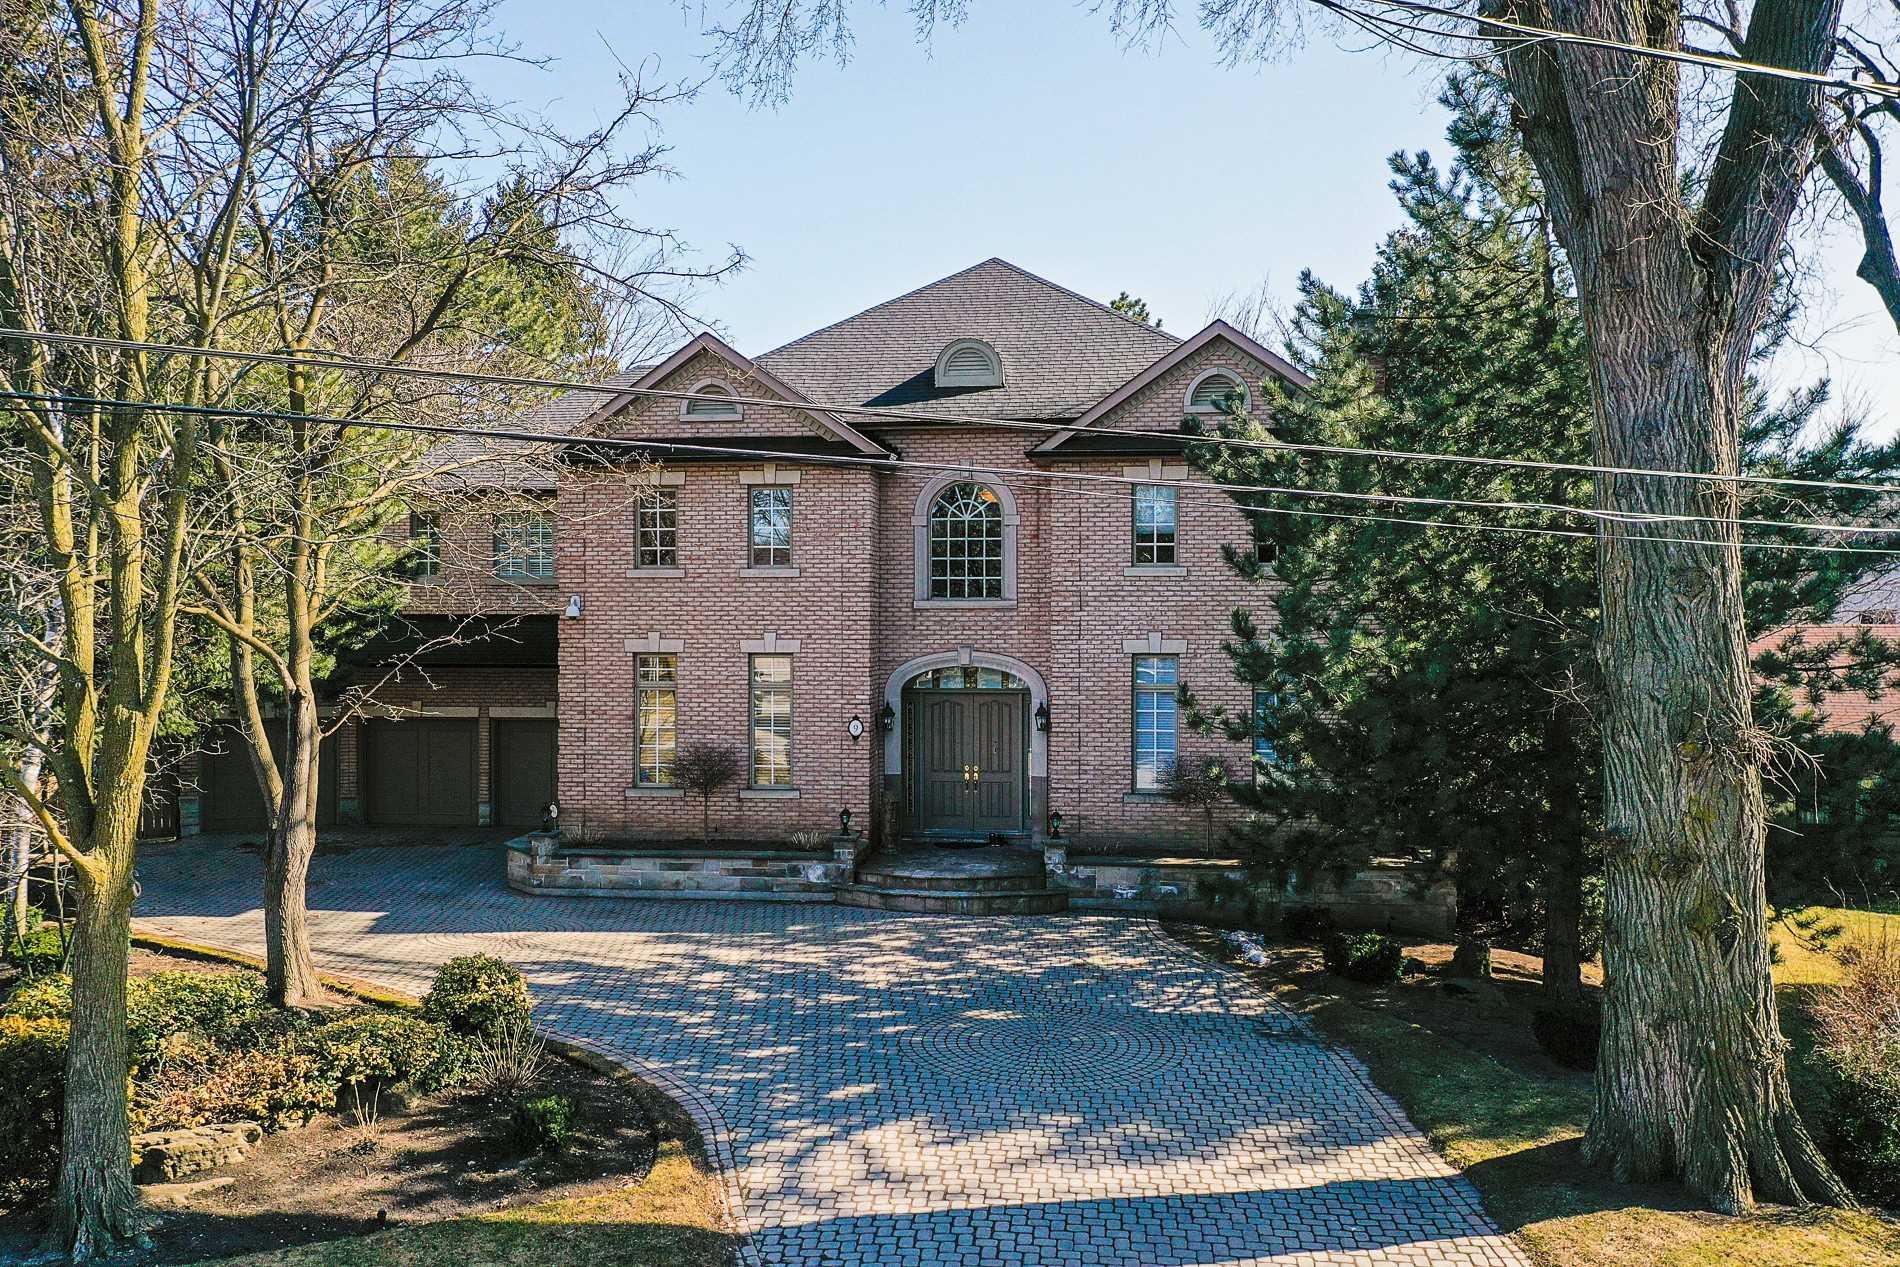 9 Berkindale Cres, Toronto, Ontario M2L2A3, 5 Bedrooms Bedrooms, 11 Rooms Rooms,8 BathroomsBathrooms,Detached,For Sale,Berkindale,C5191744